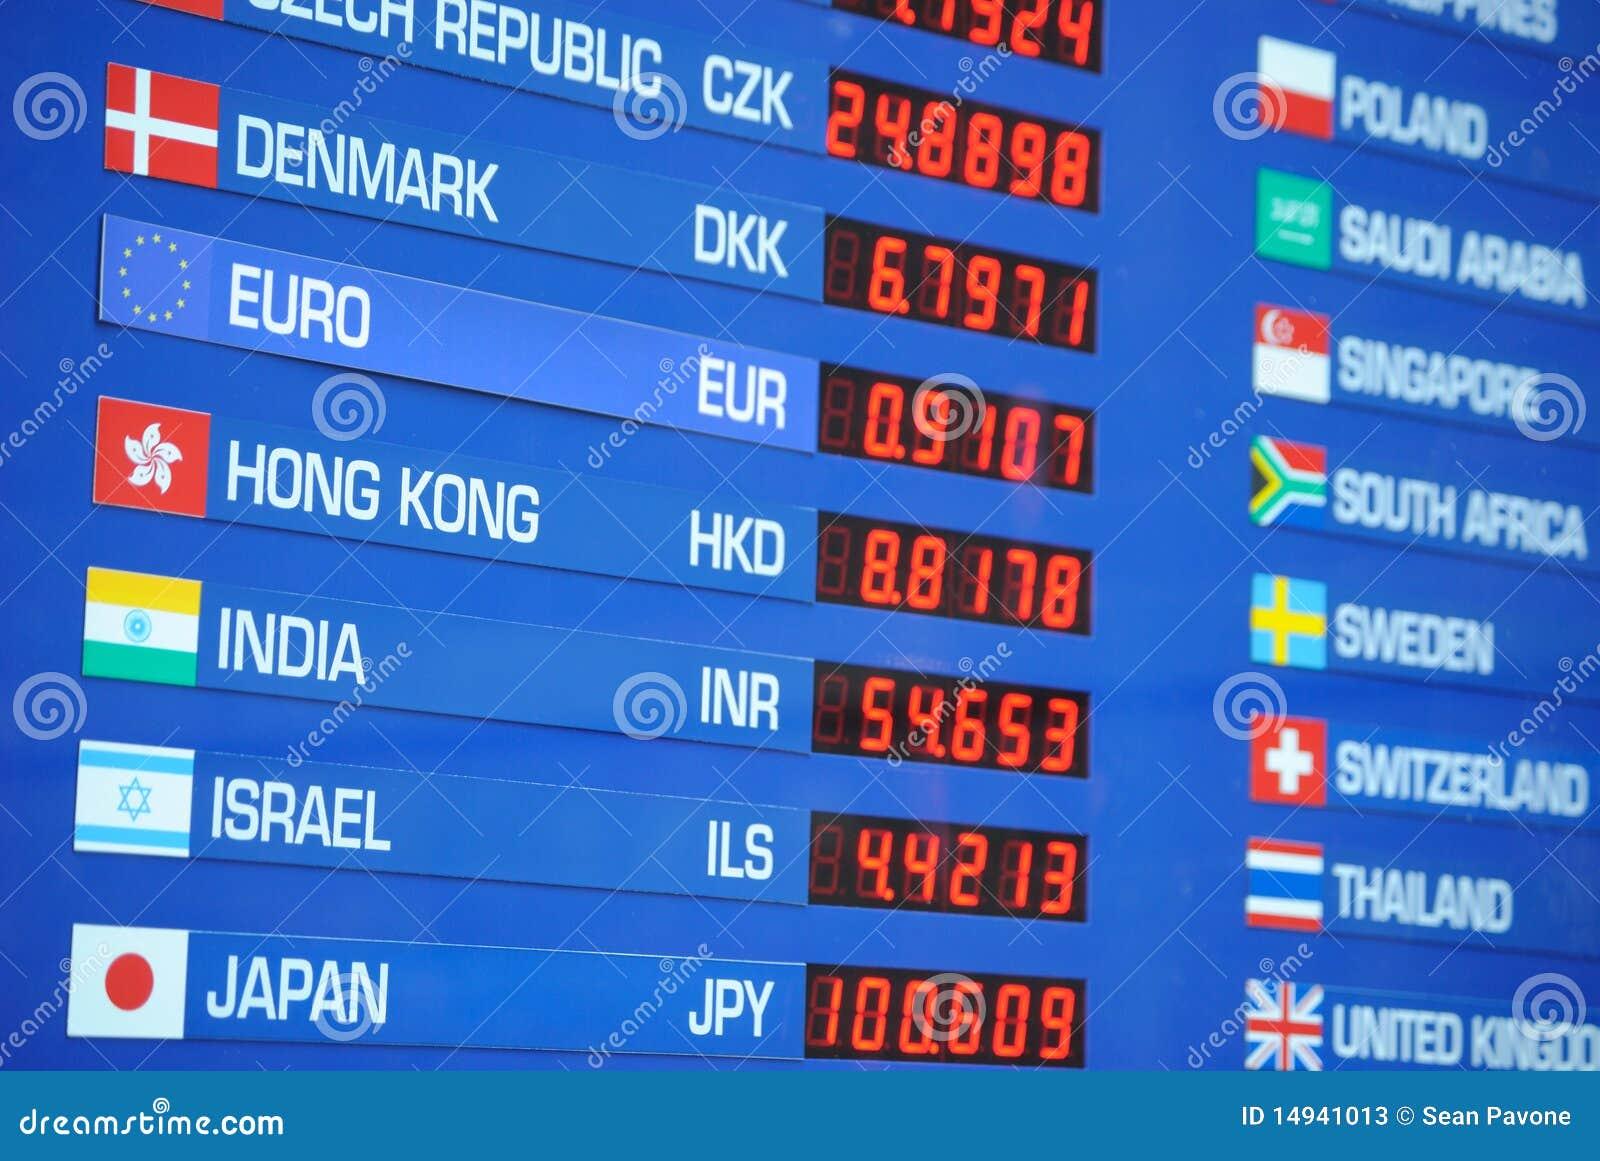 Stock exchange rate